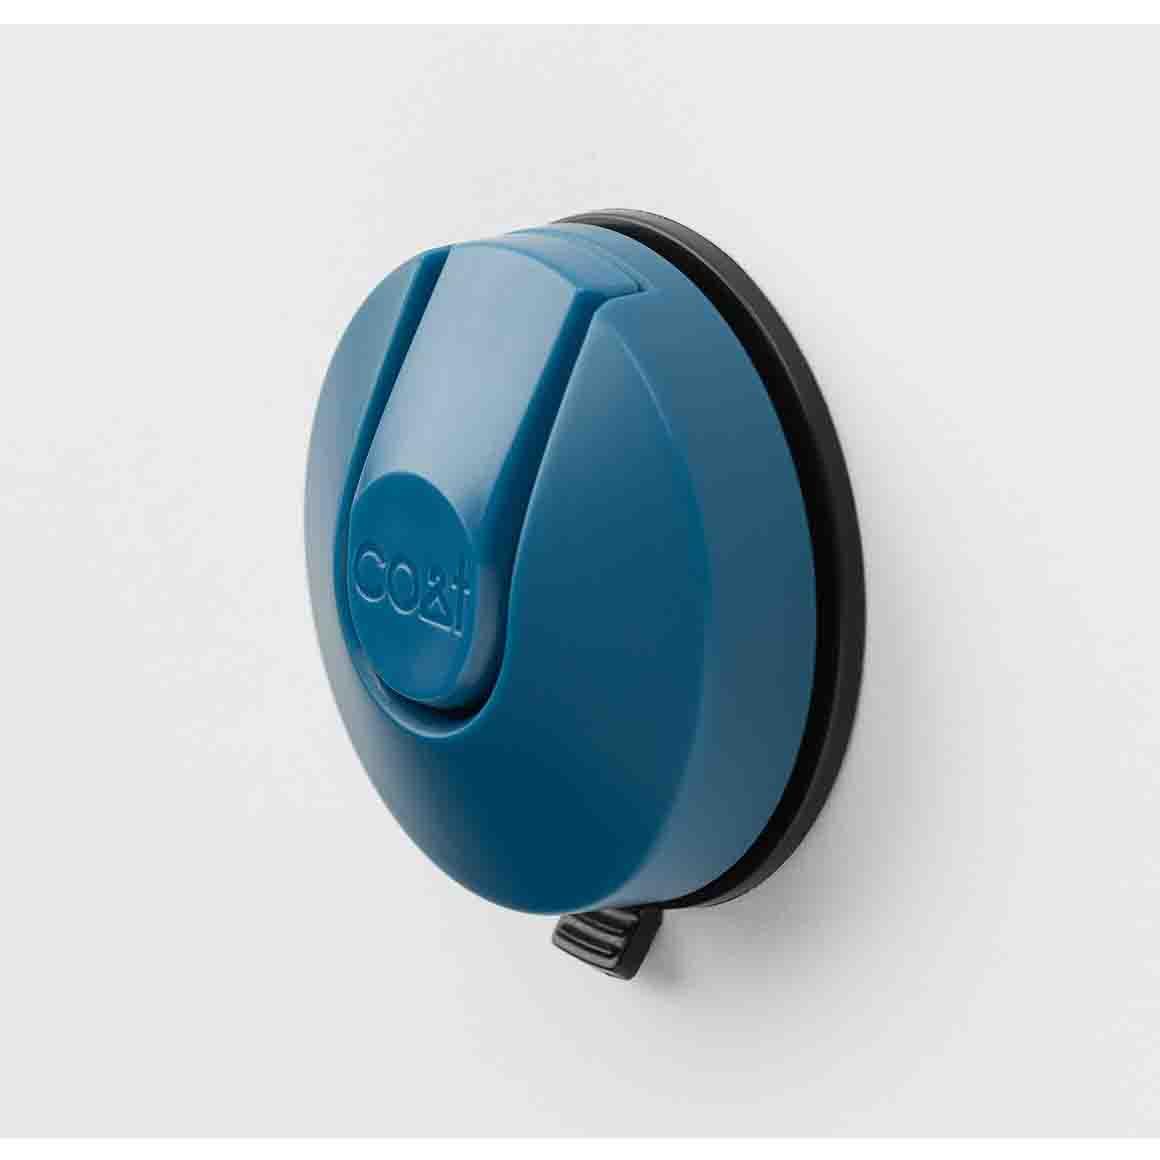 COAT 1.0 Blue | Trada Marketplace